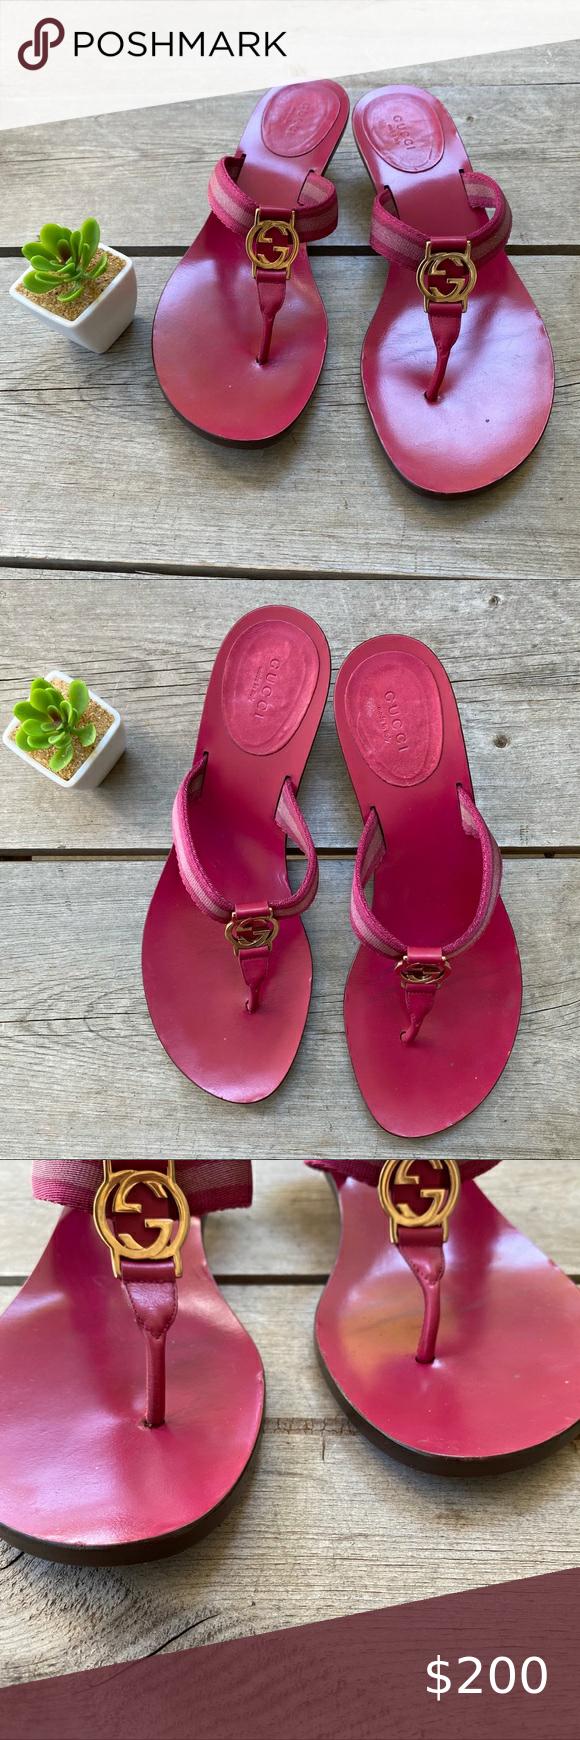 Gucci Pink Gold Flip Flops Kitten Heel In 2020 Gold Flip Flops Kitten Heels Pink Sandals